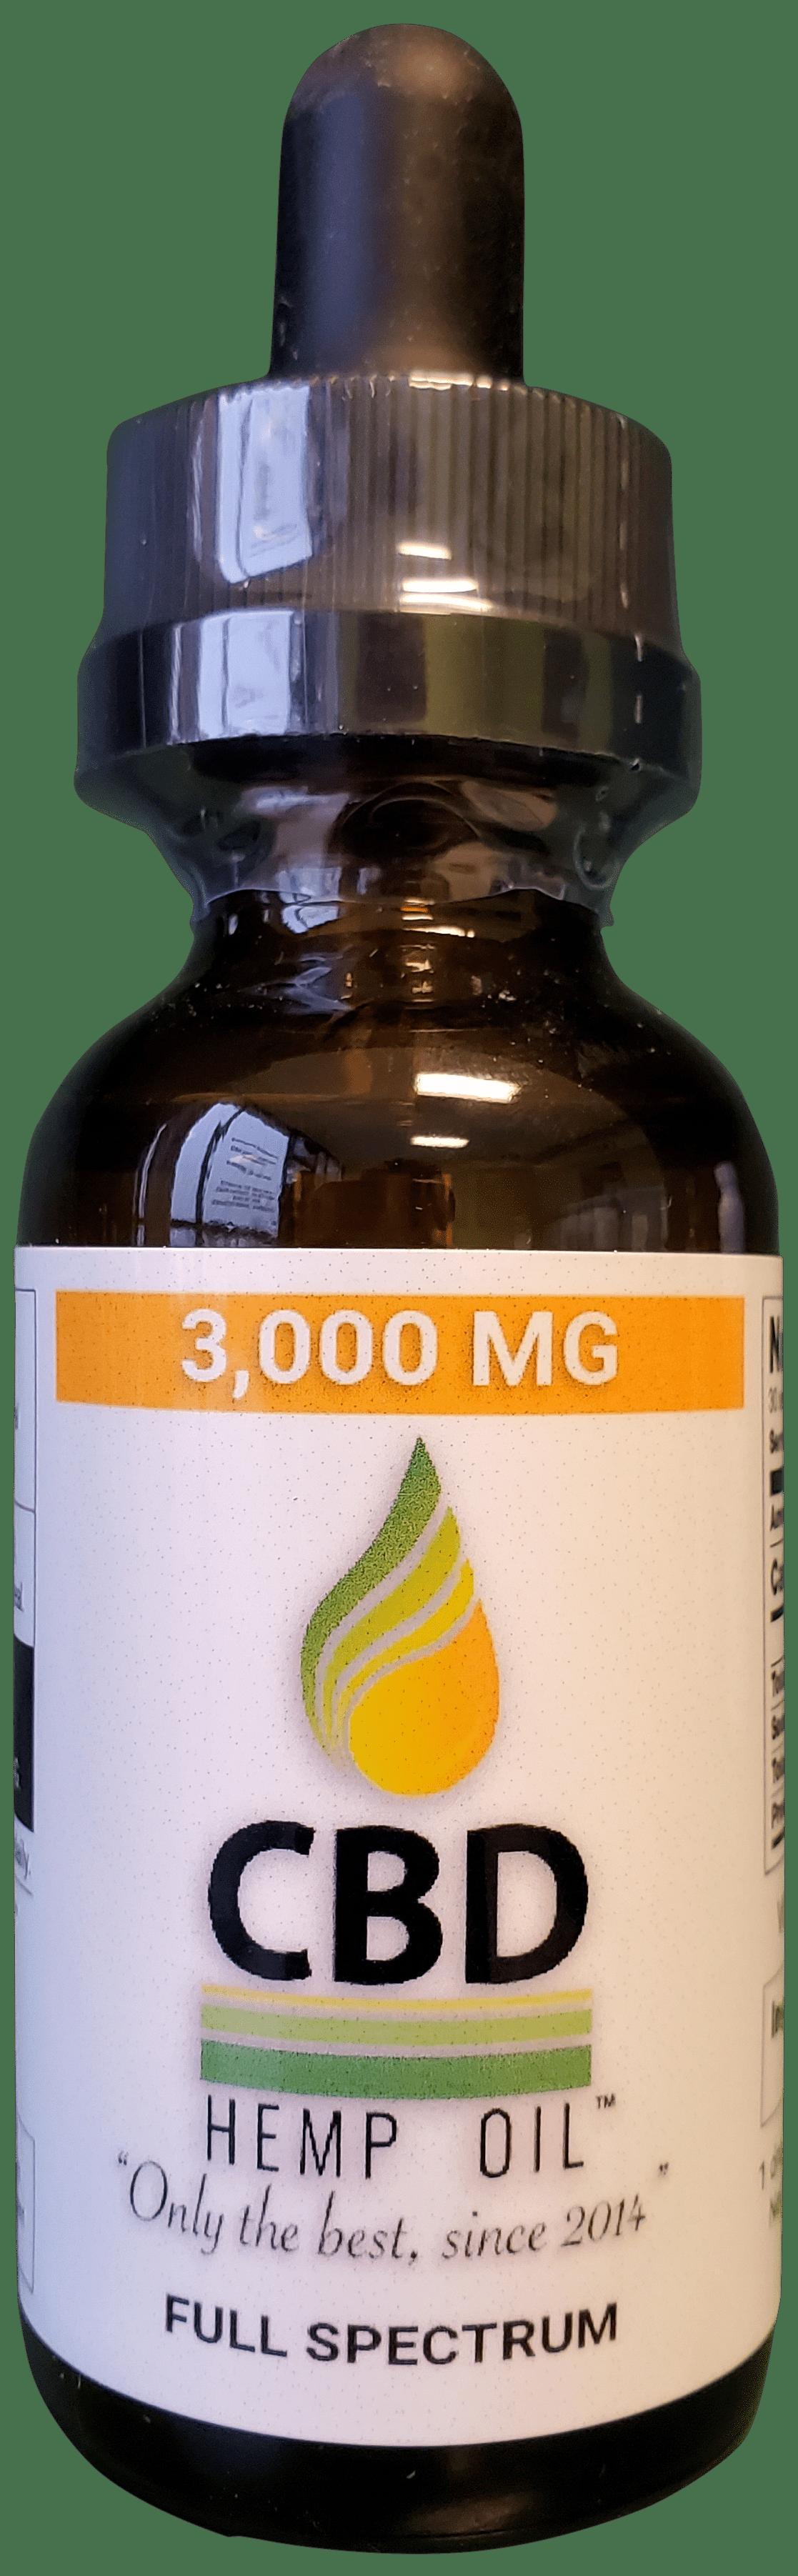 CBD Hemp Oil Dayton 3,000 mg